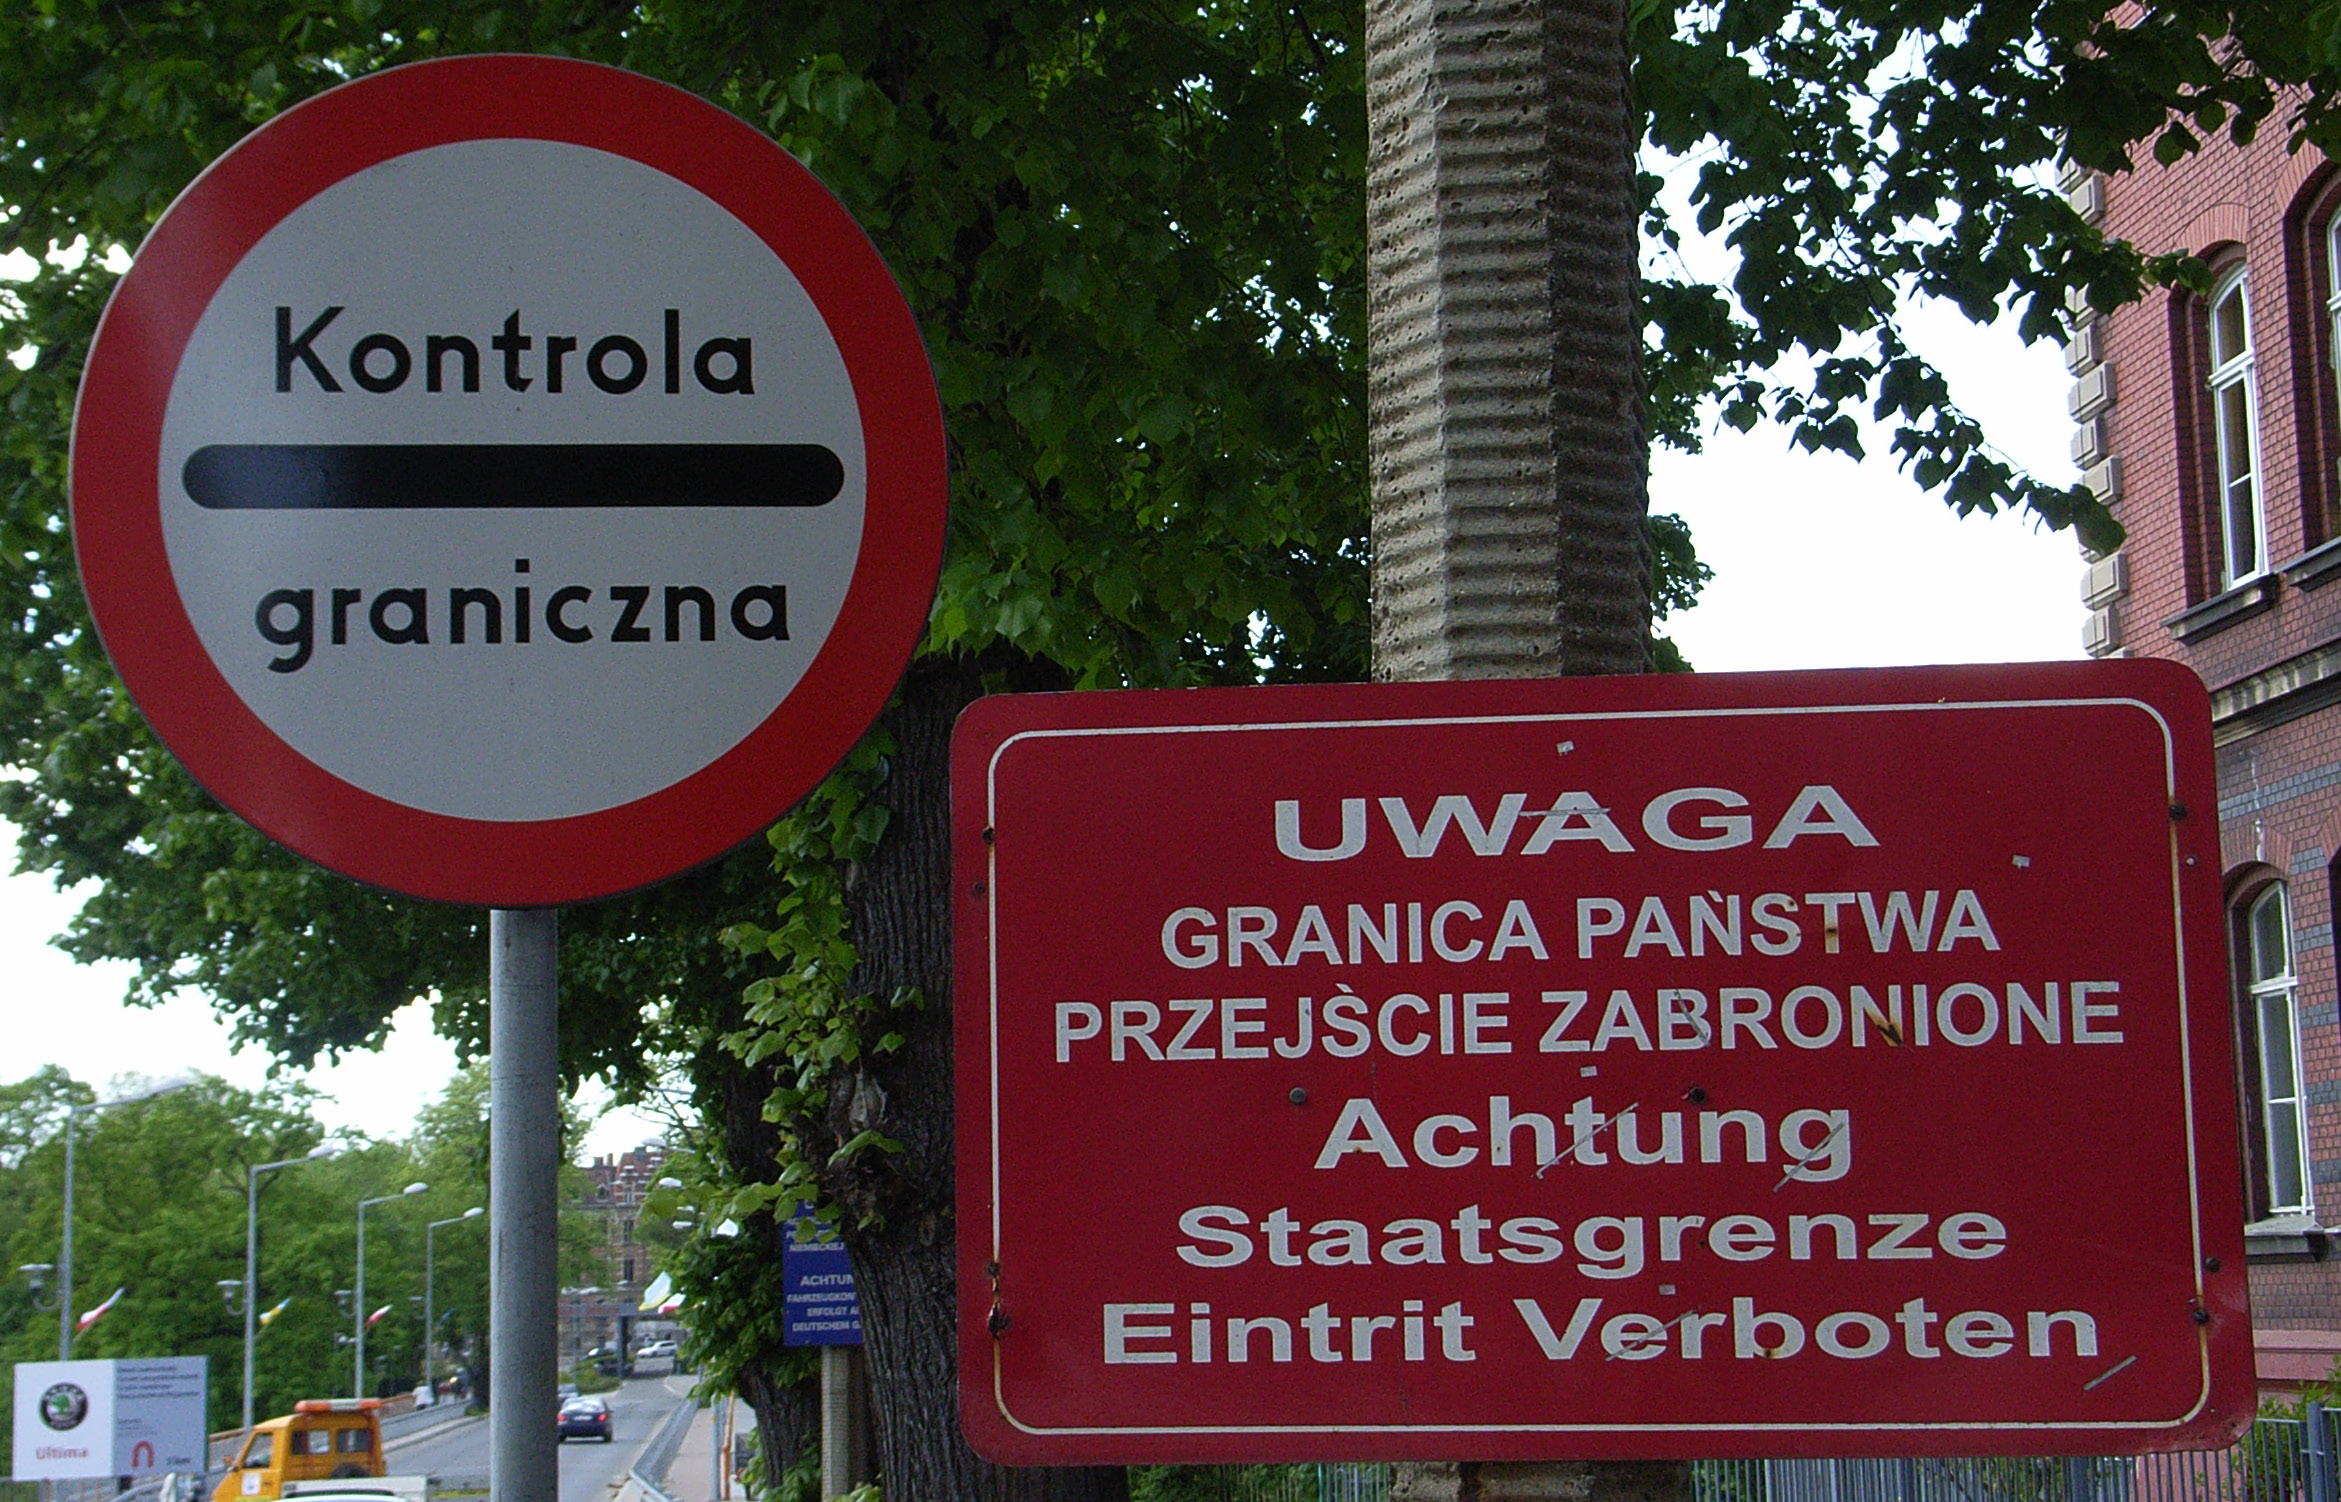 File:Warnhinweise (polnisch).jpg - Wikimedia Commons